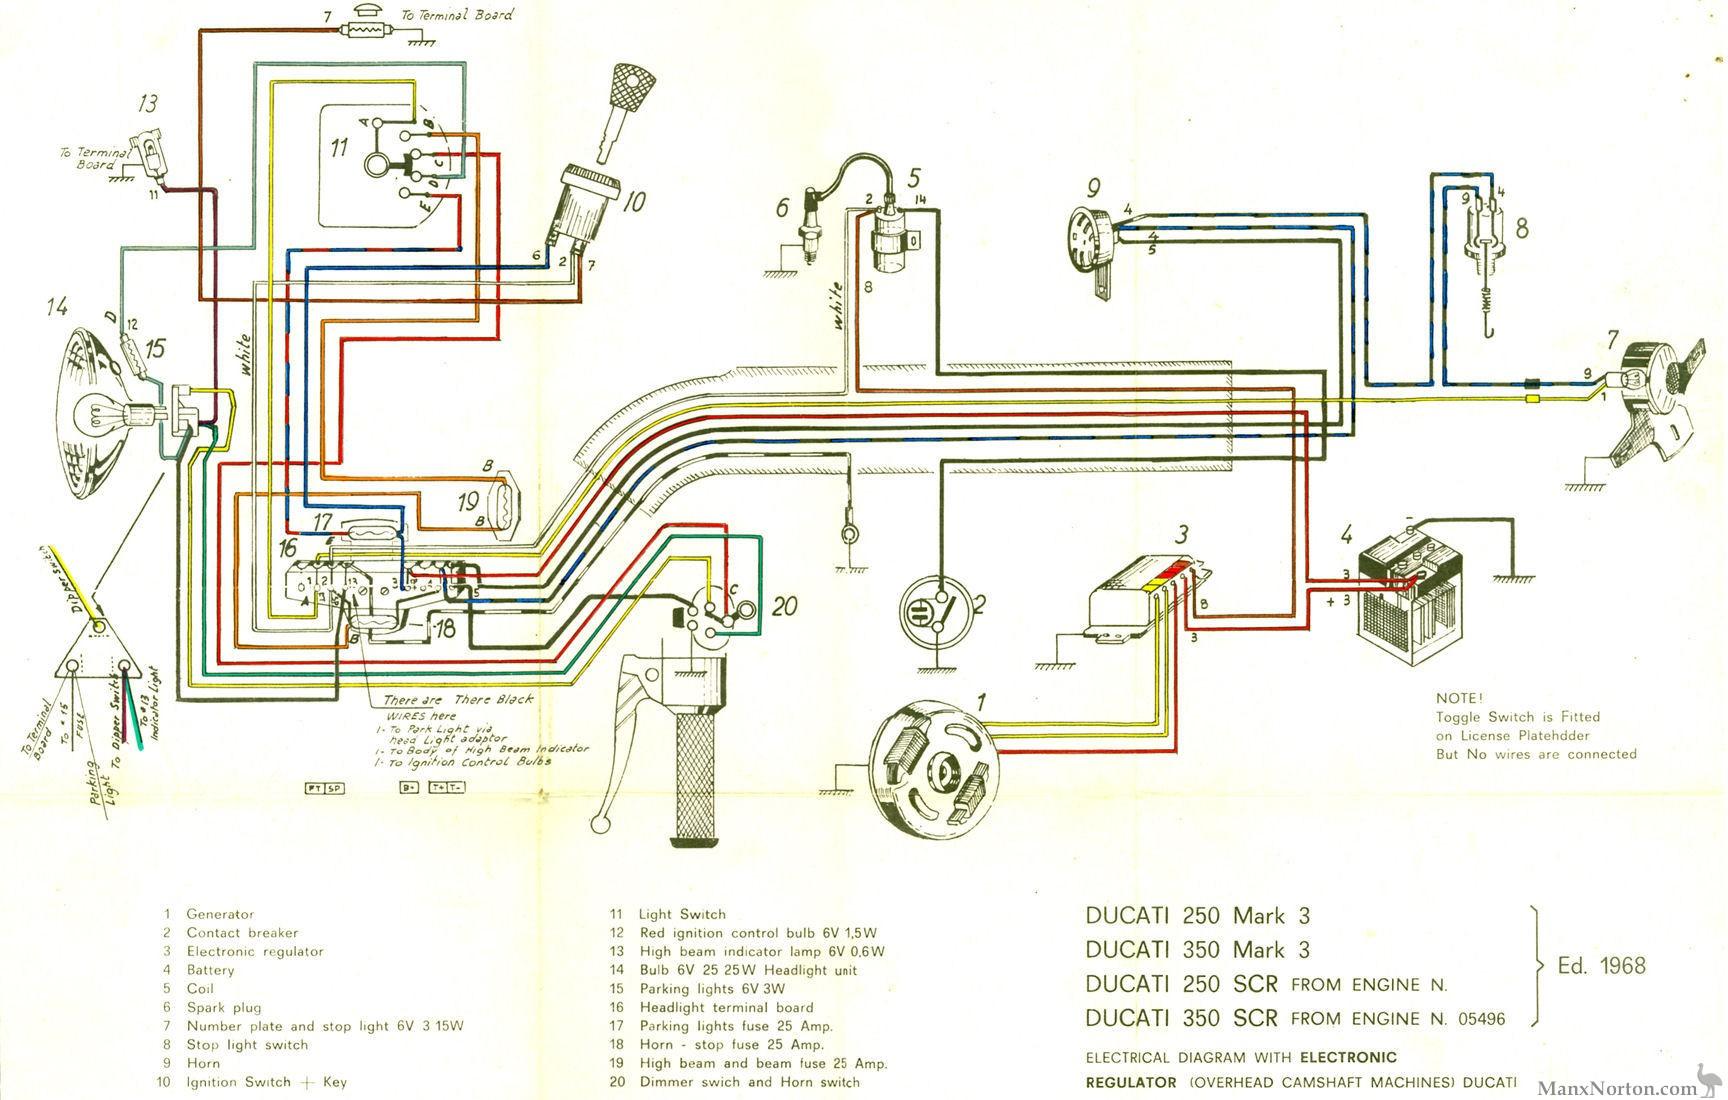 2004 Chevy Malibu Ignition Switch Wiring Diagram